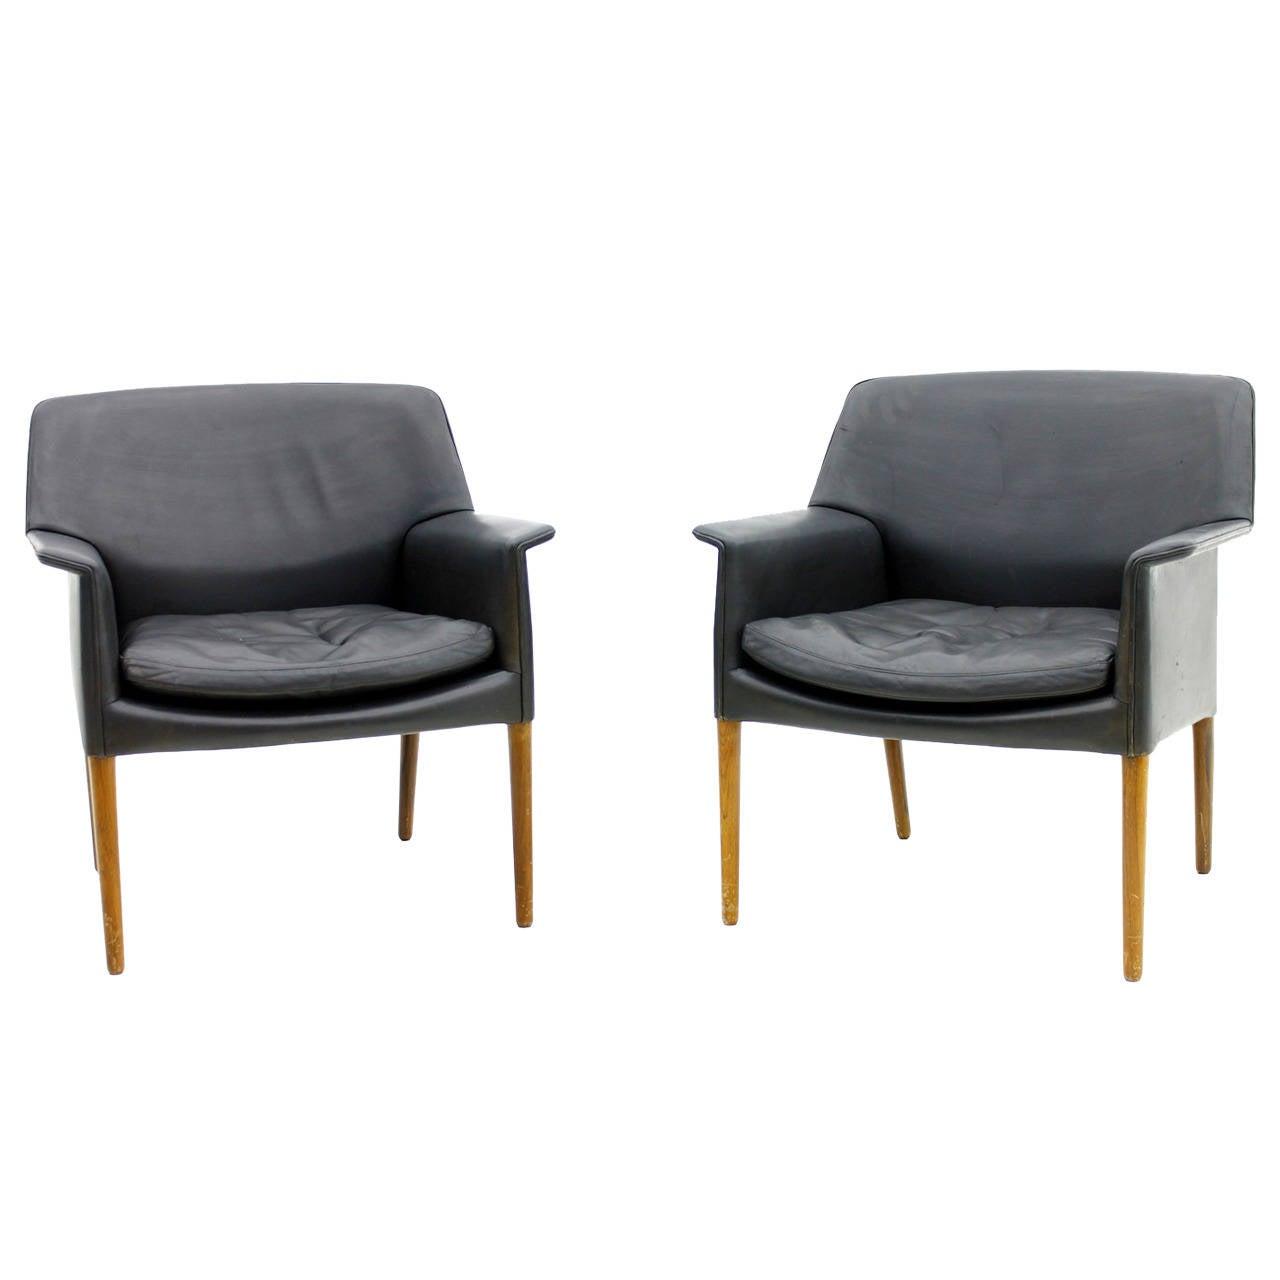 Pair Danish Lounge Chairs by Ejnar Larsen & Aksel Bender